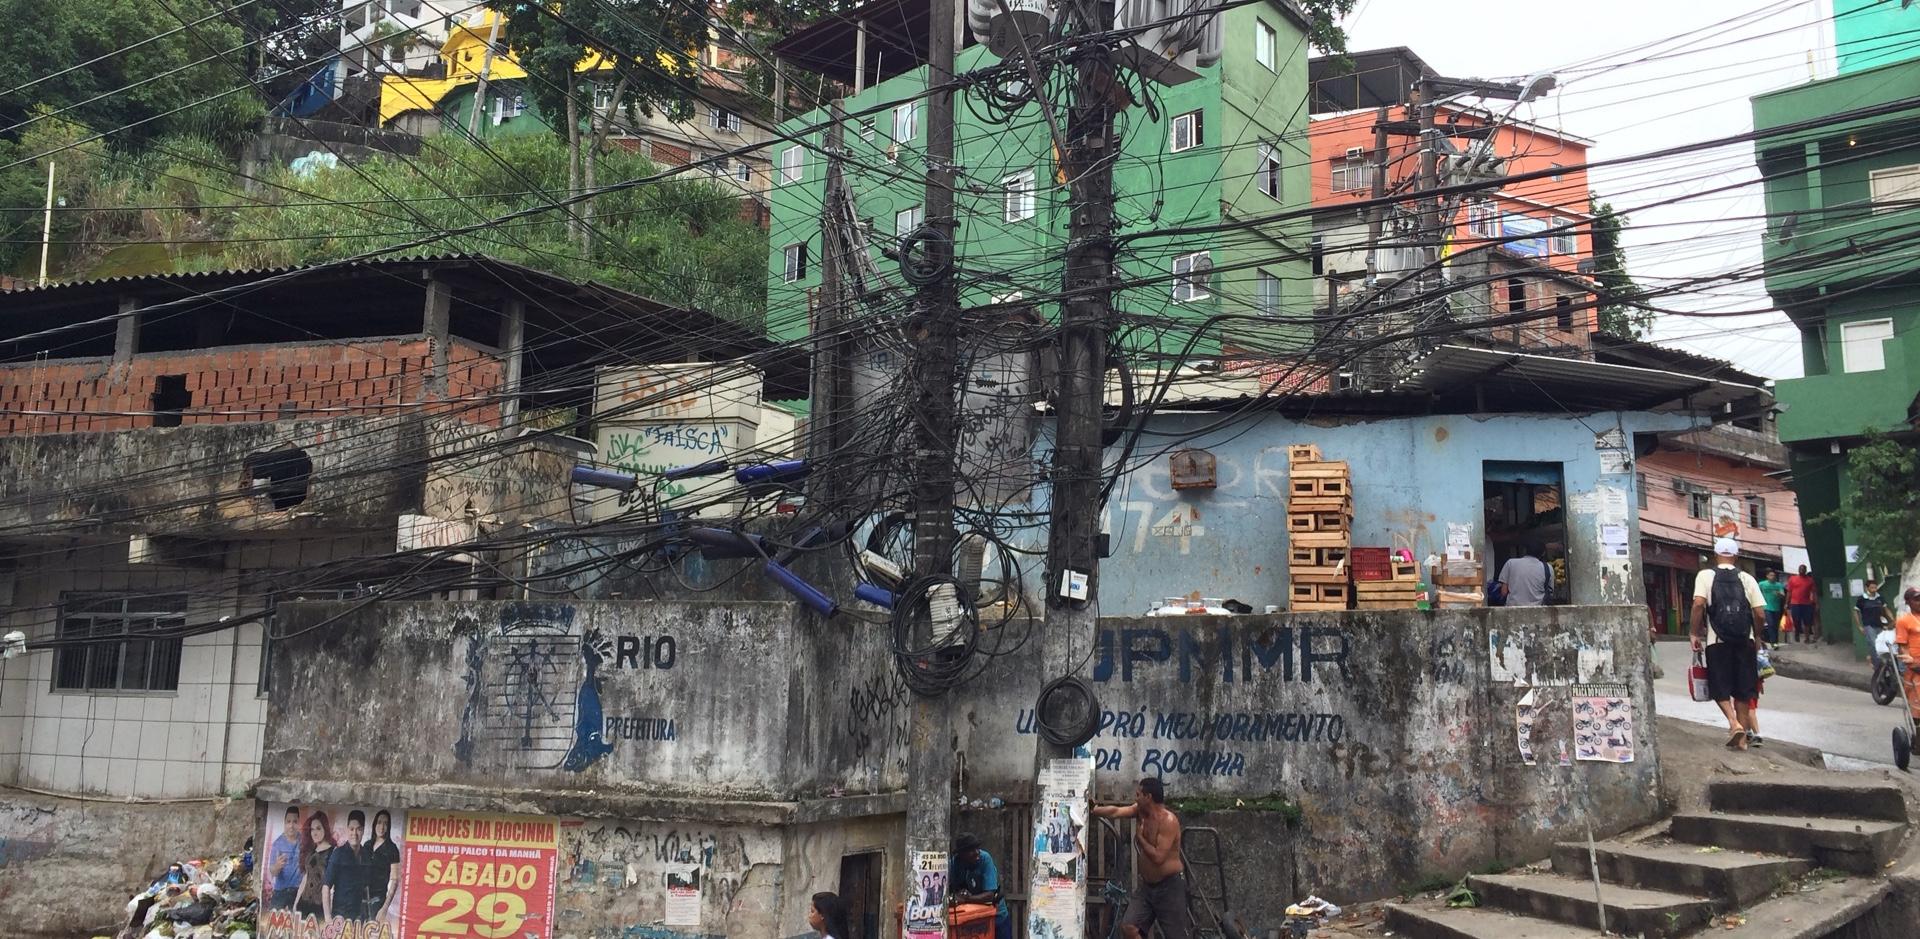 Rio-barriada